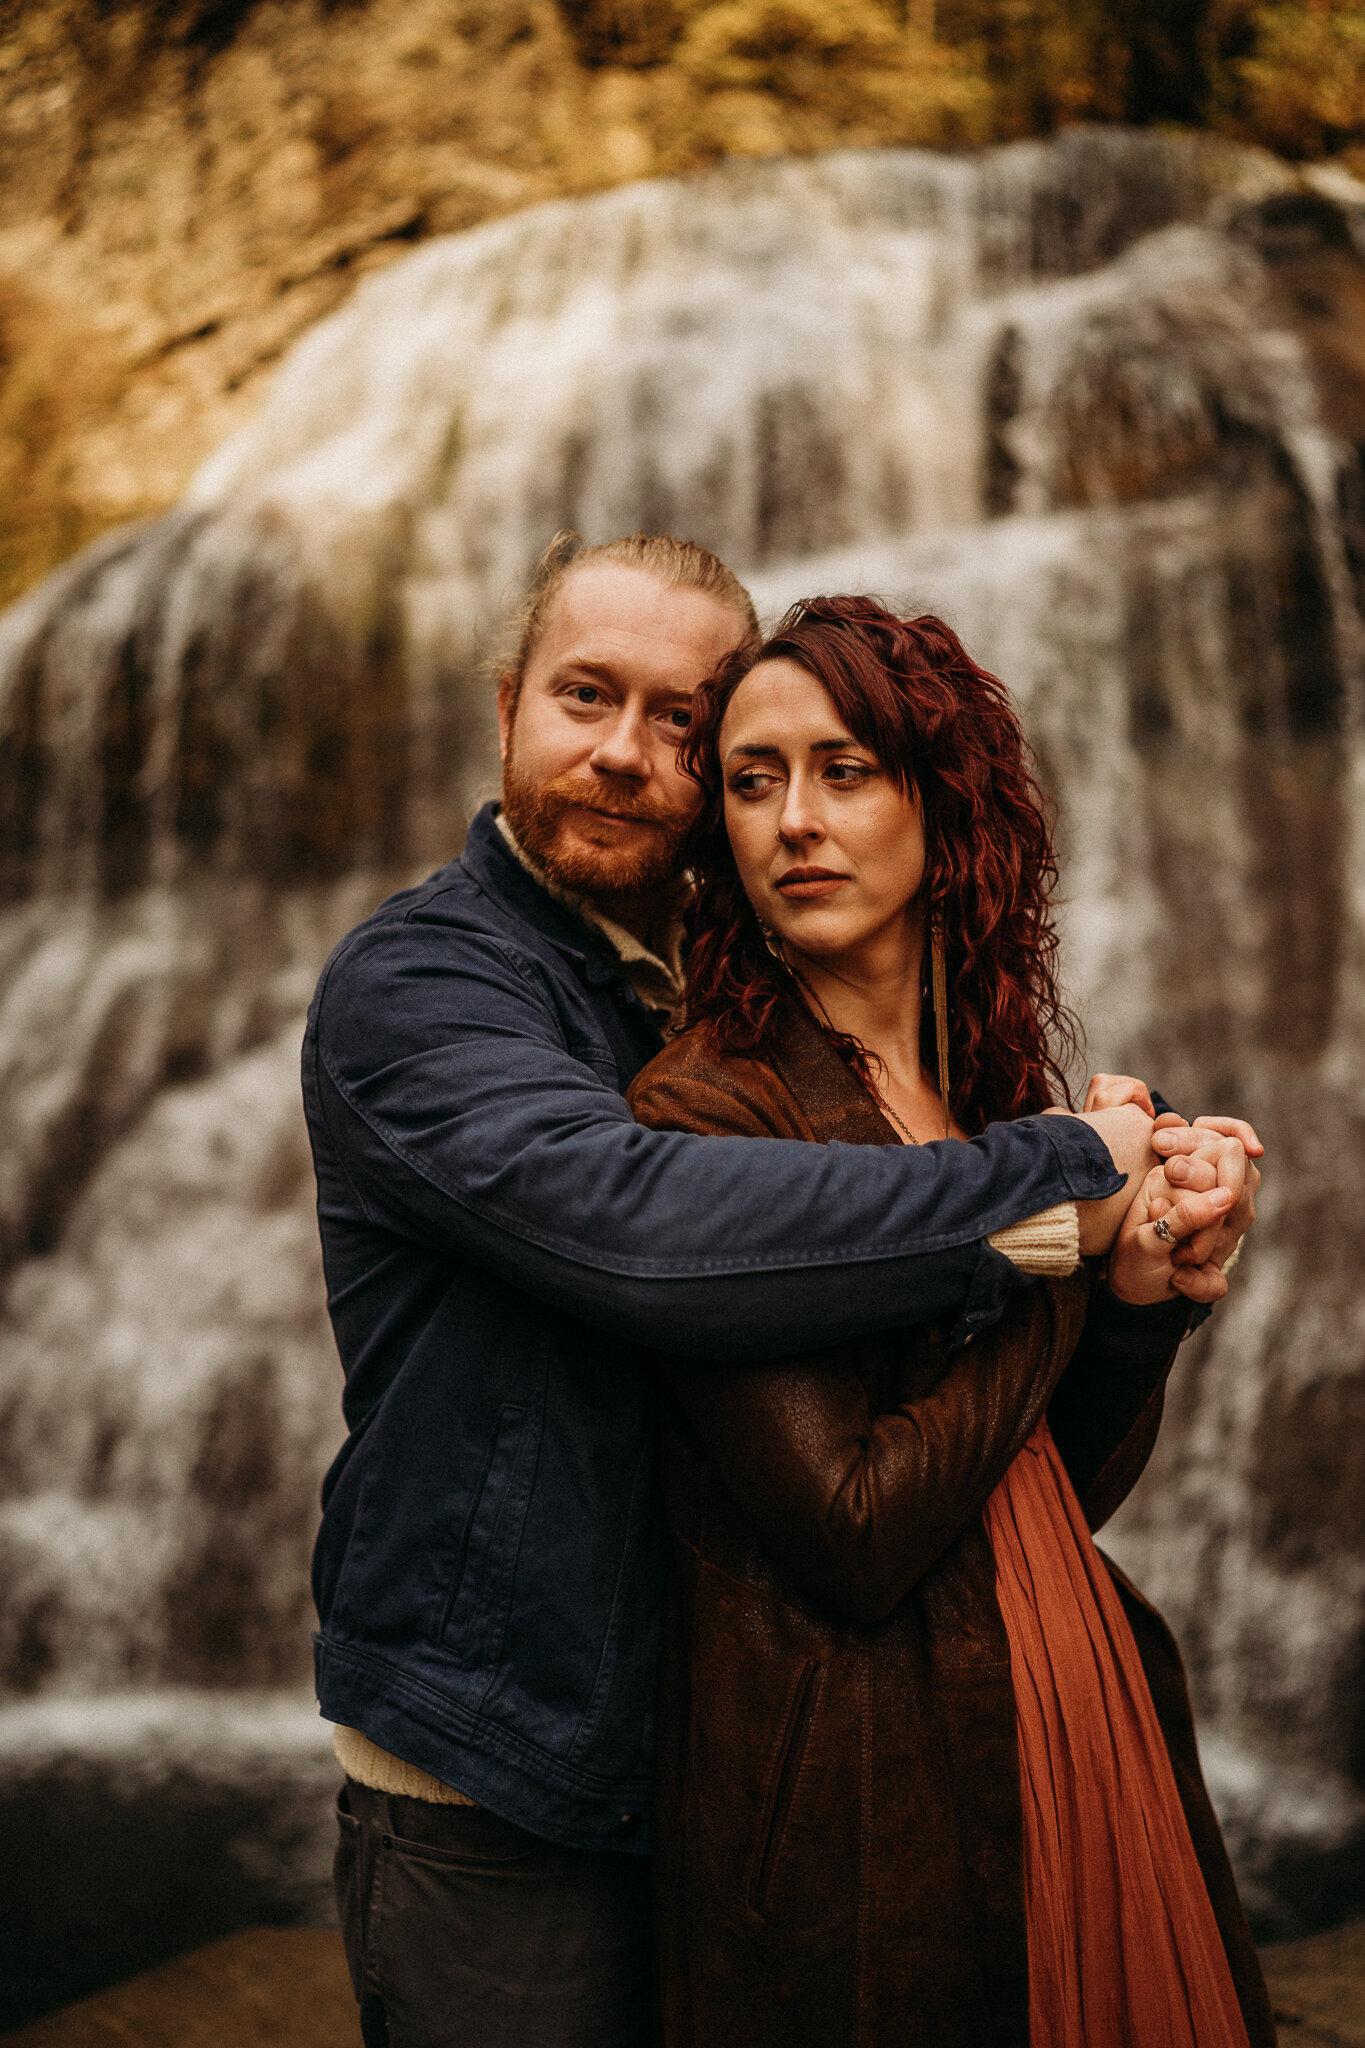 Susan And Kirk Engagement Robert Treman park-06540.jpg